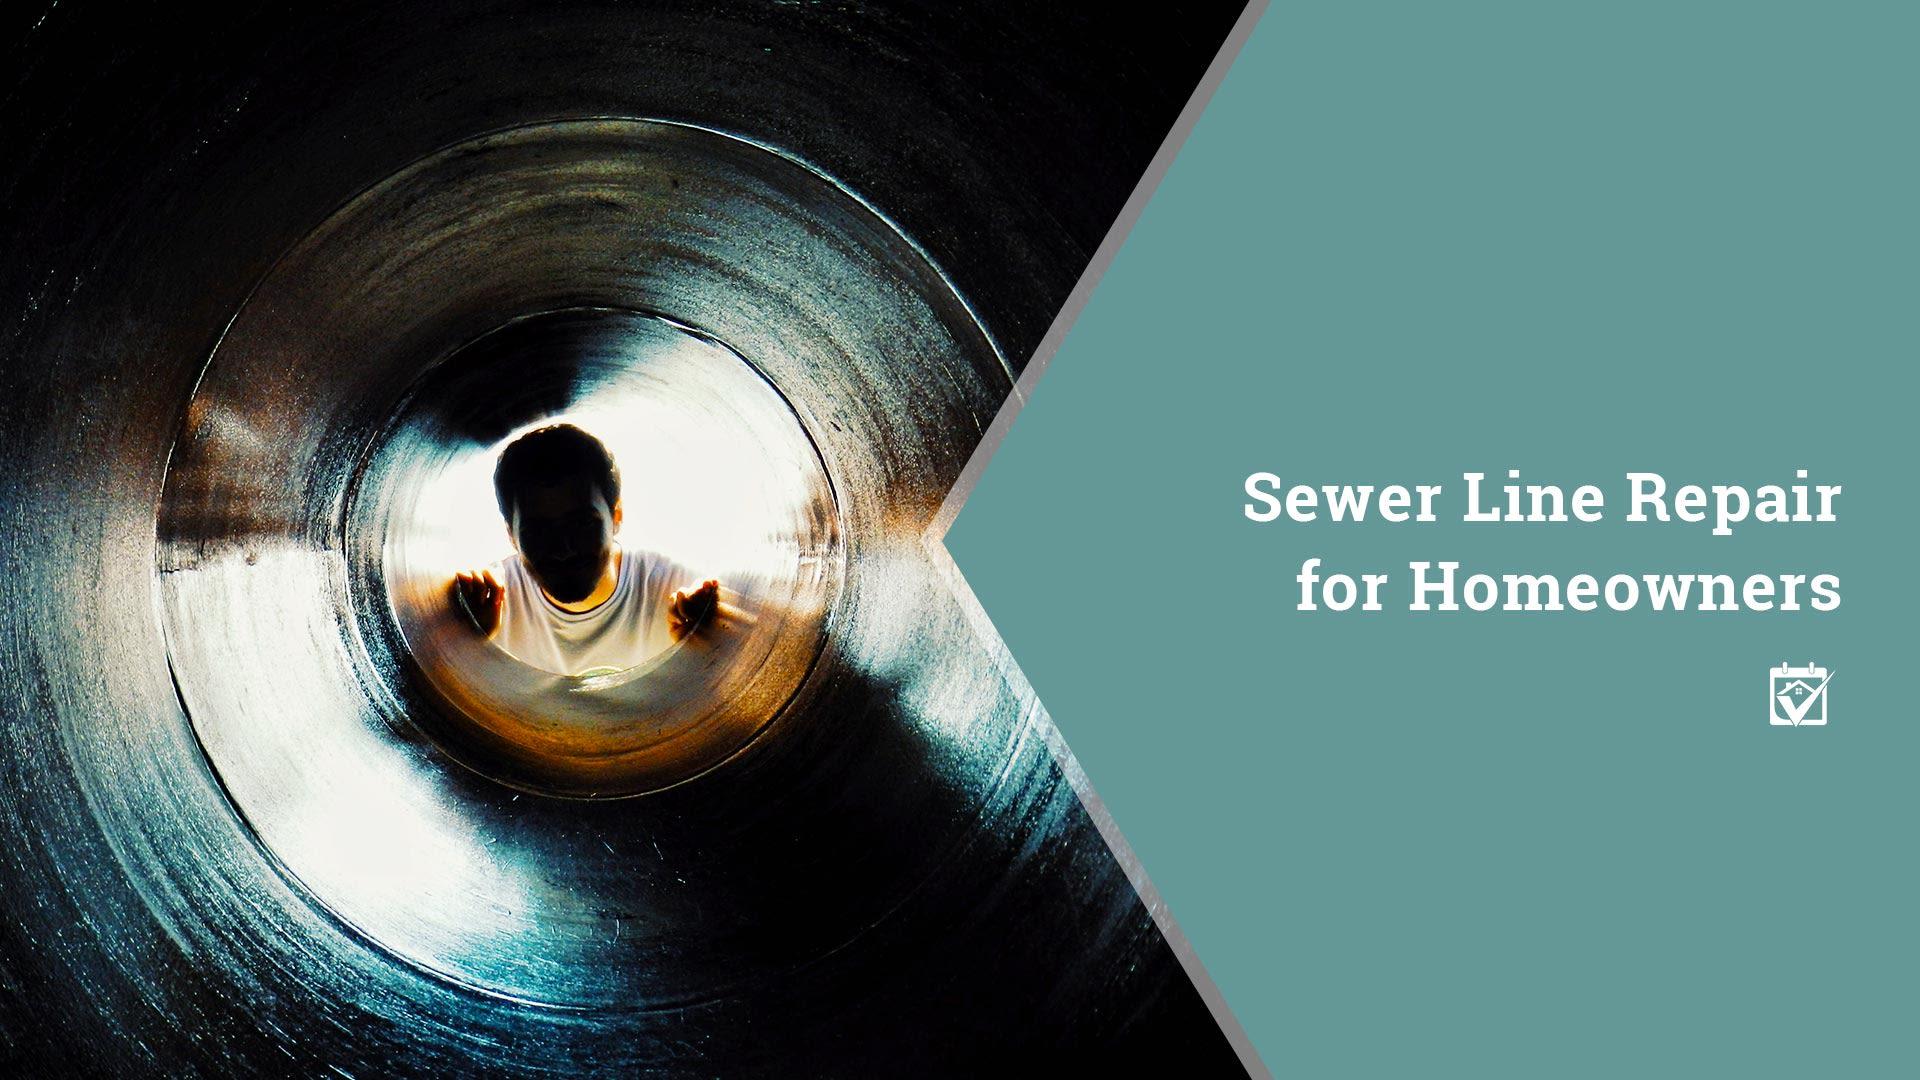 Sewer Line Repair for Homeowners